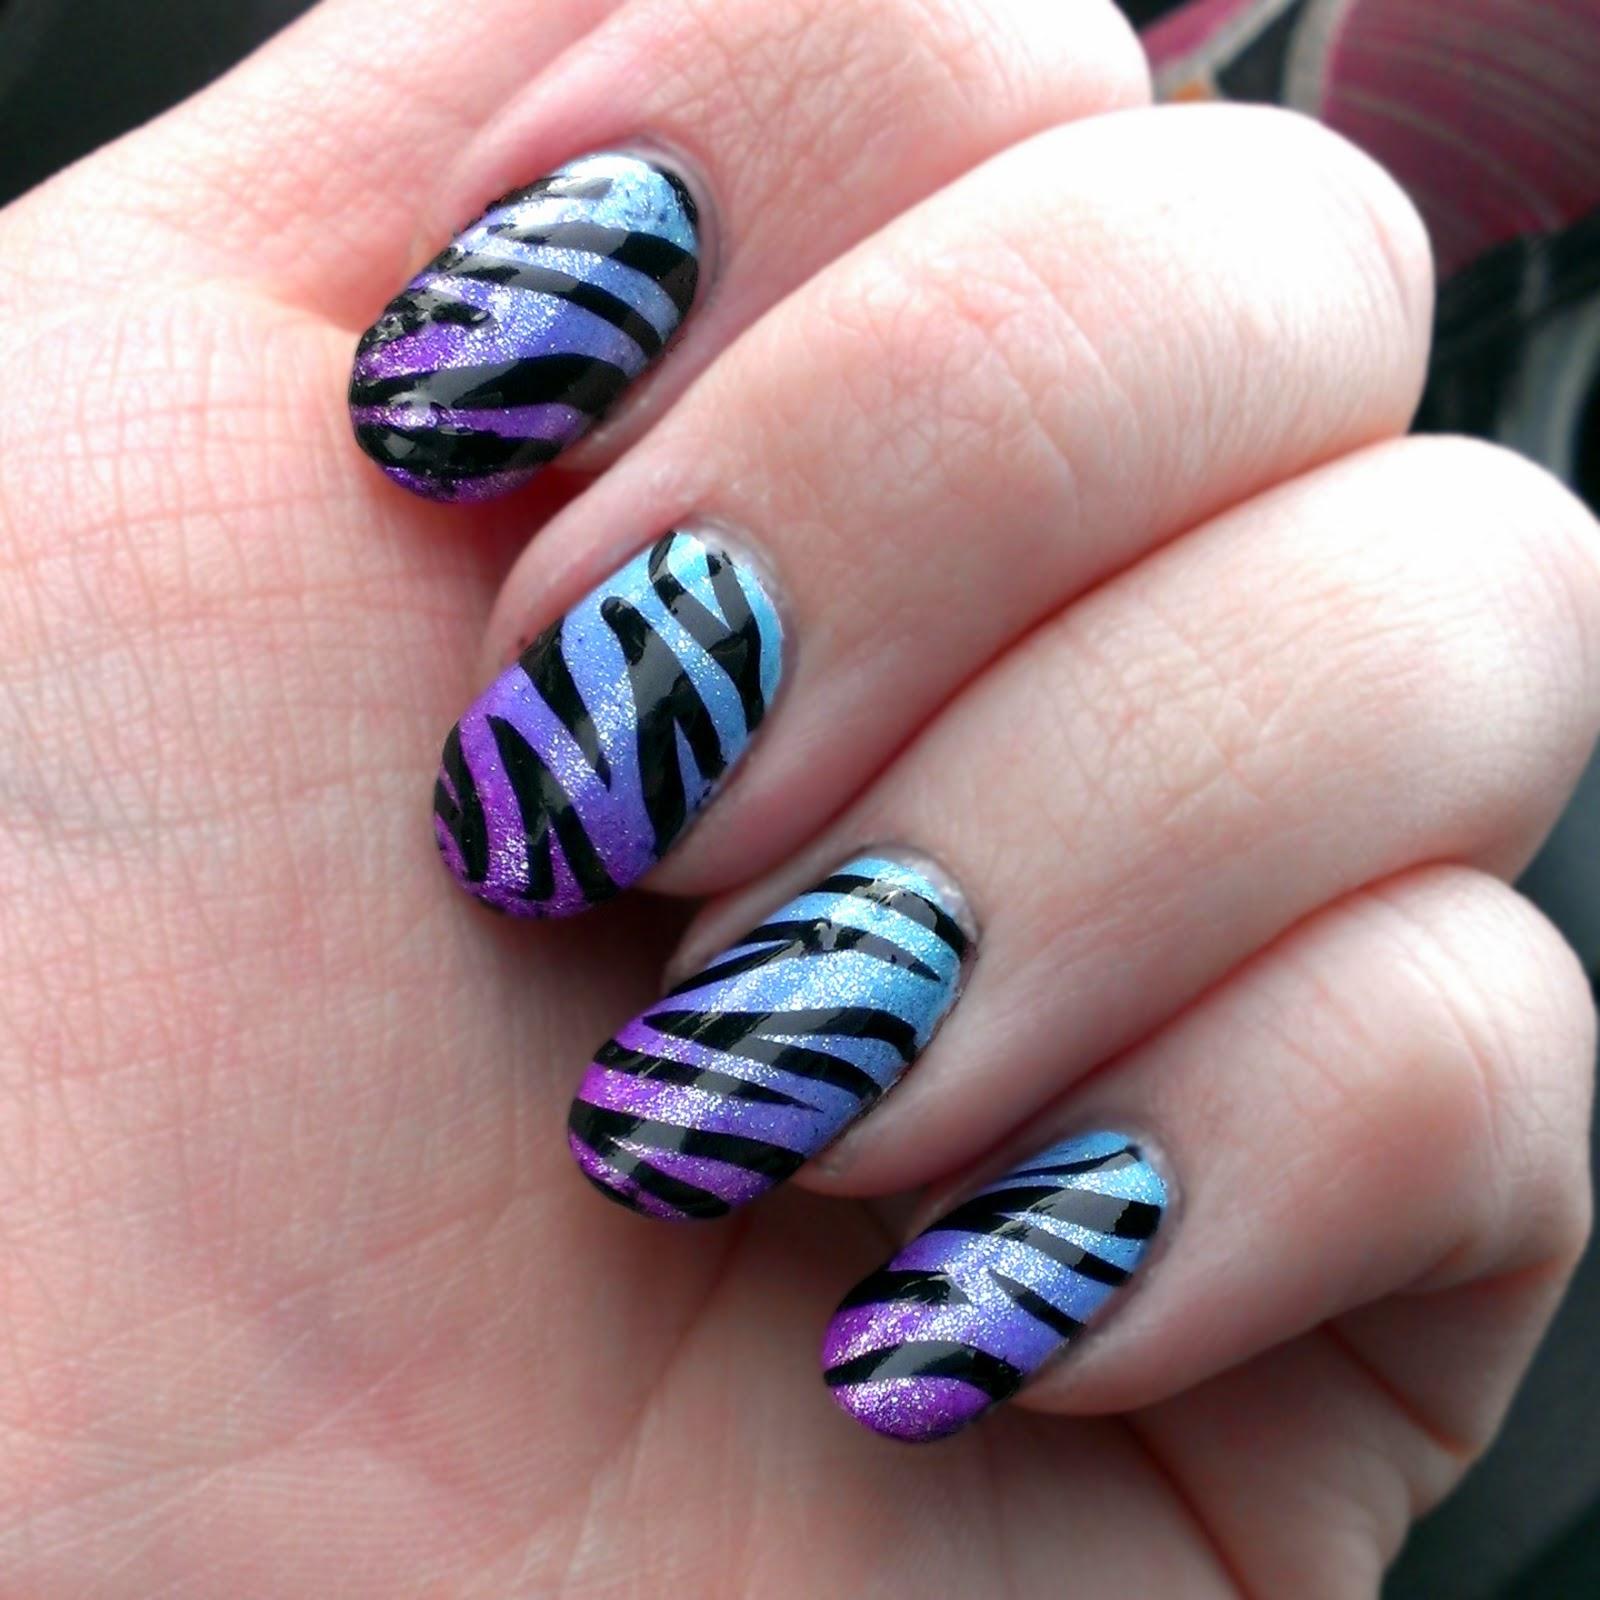 Nail Art Zebra Stripes: Nail It With NeNe: Blue/Purple Ombre Zebra Nail Art